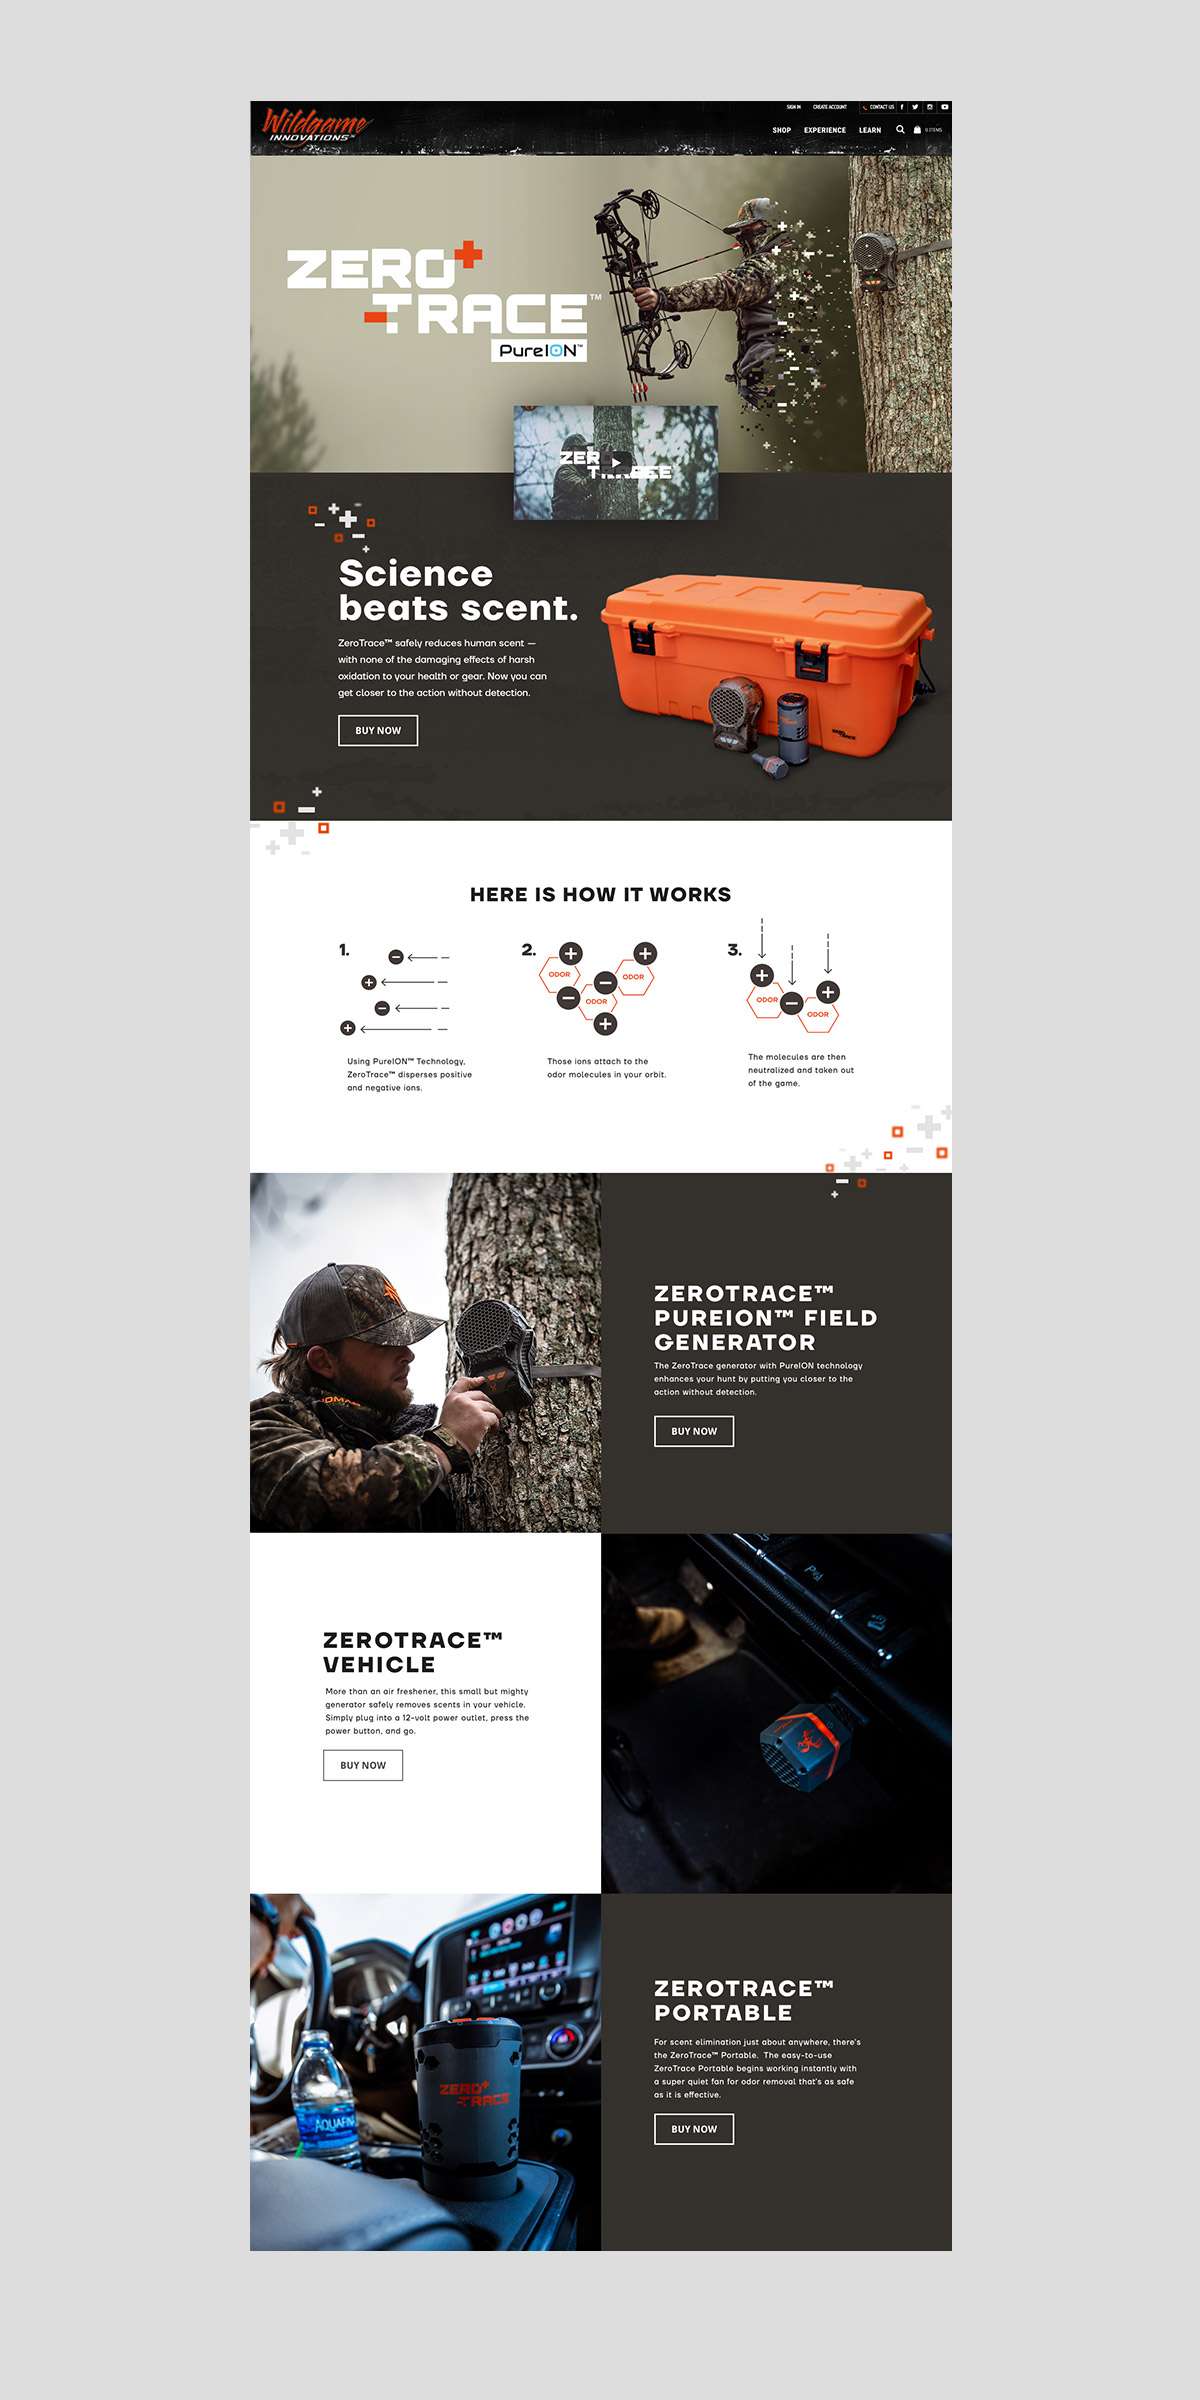 wildgame innovations website design